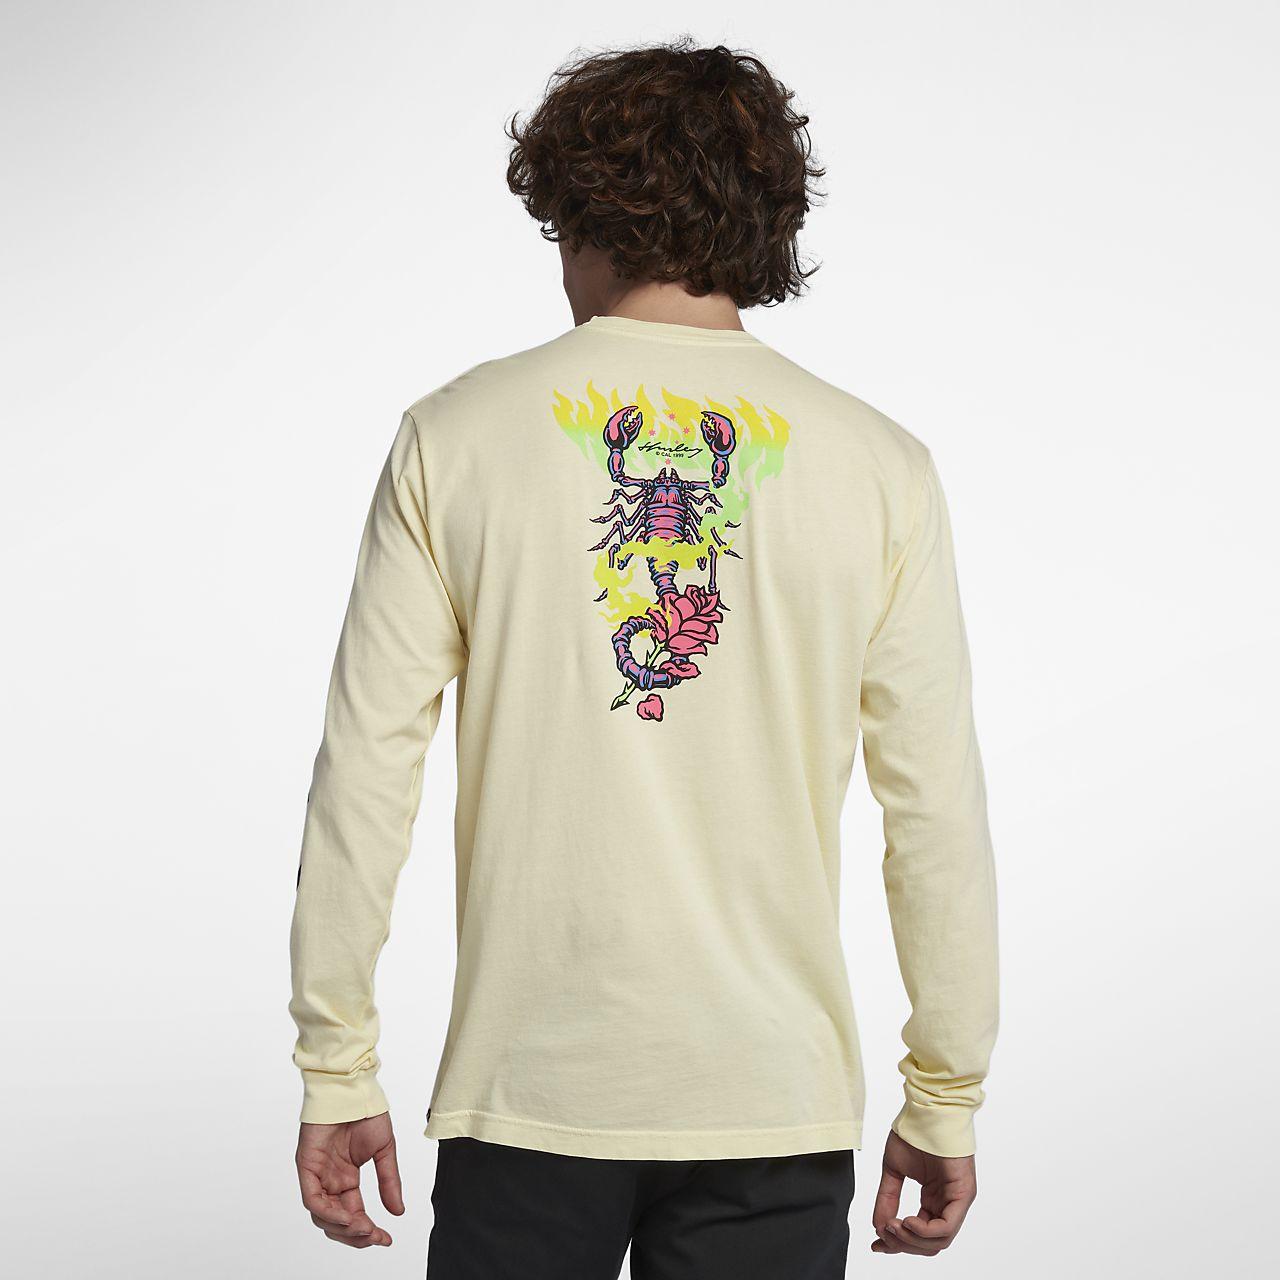 Tee-shirt à manches longues Hurley Team Wilson pour Homme